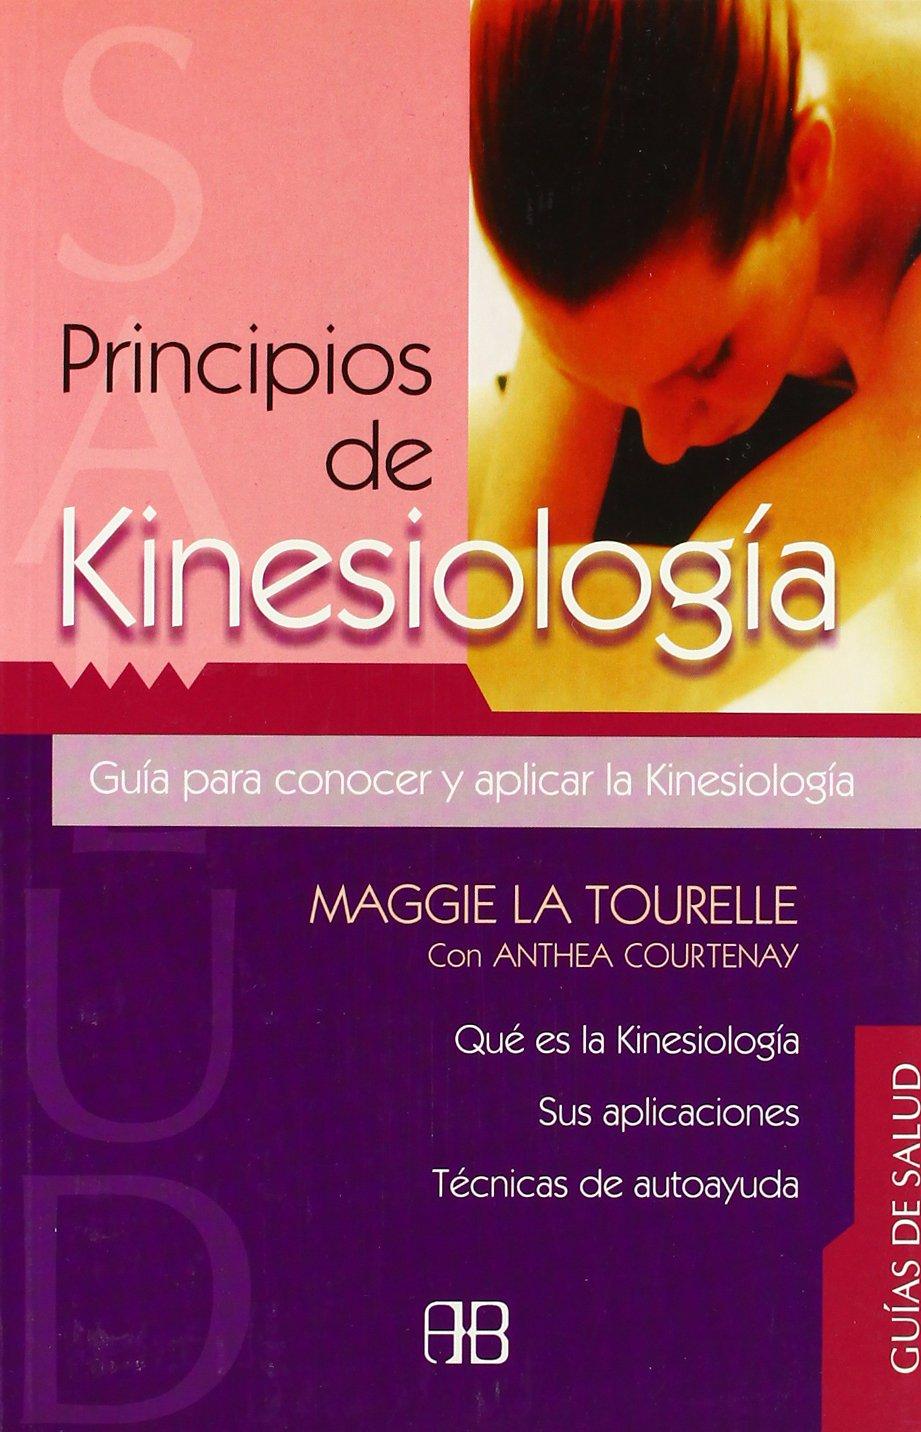 Principios De Kinesiologia Principles Of Kinesiology Guia Para  # Muebles Kinesiologia